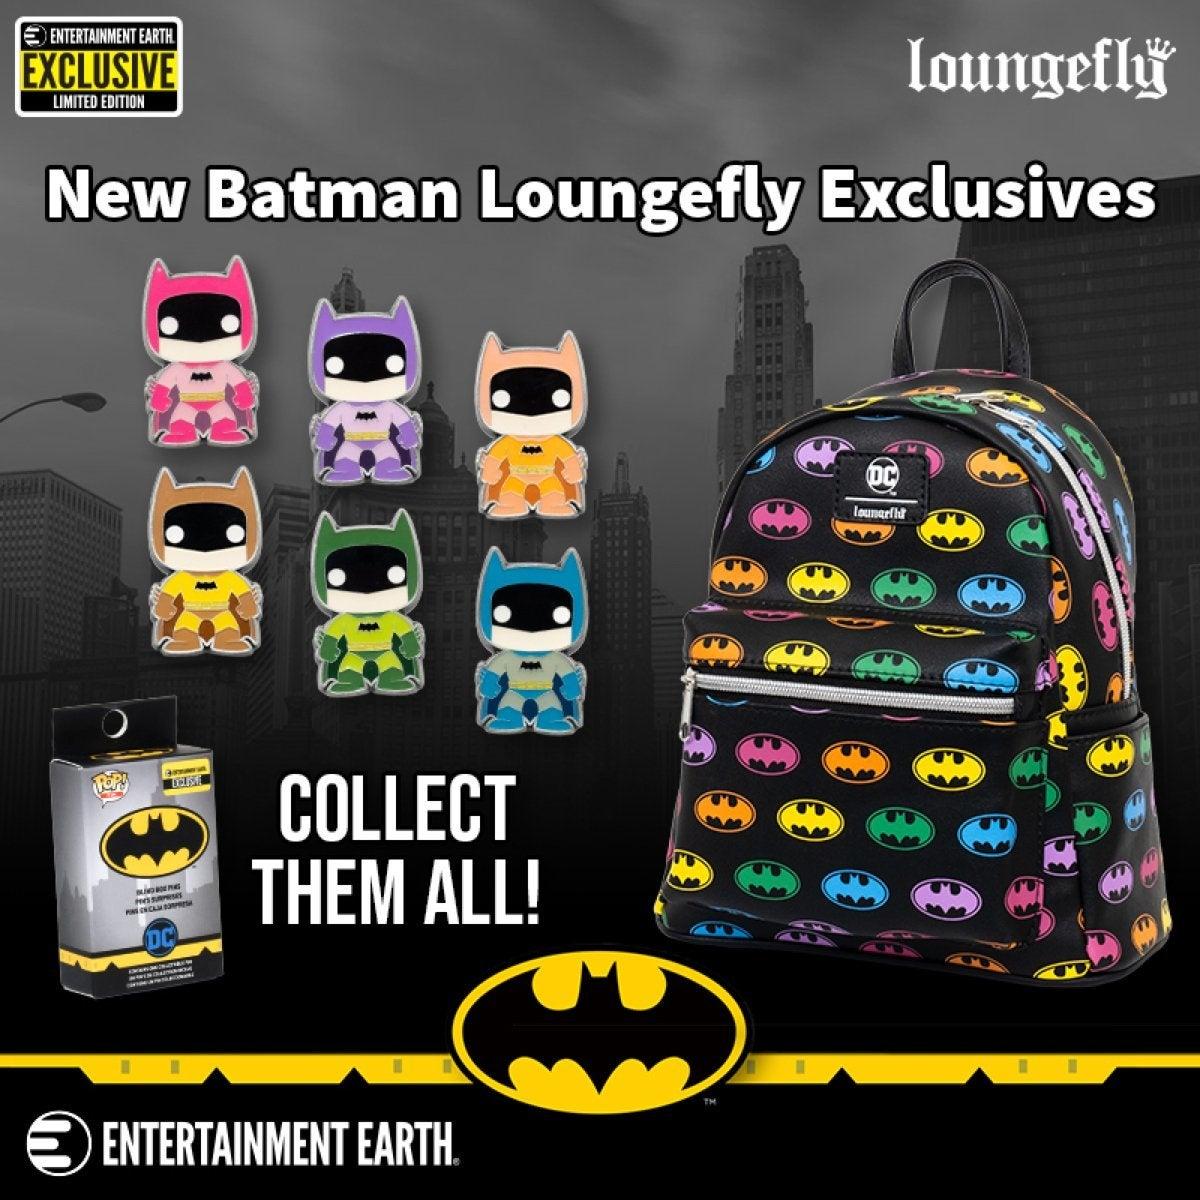 loungefly-rainbow-batman